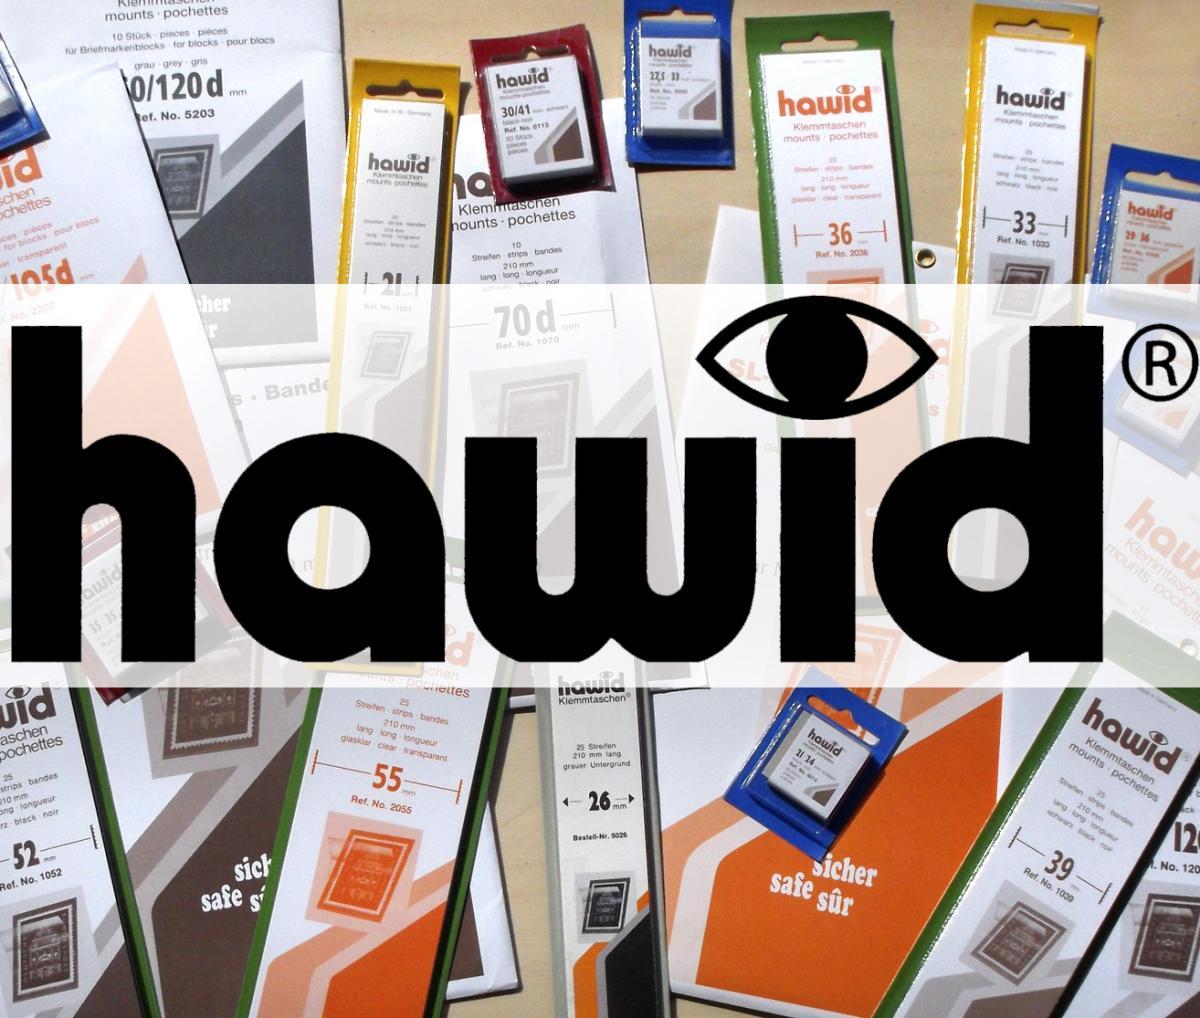 HAWID-Sonderblocks 1305, 74x105 mm, schwarz, 10 Stück 0